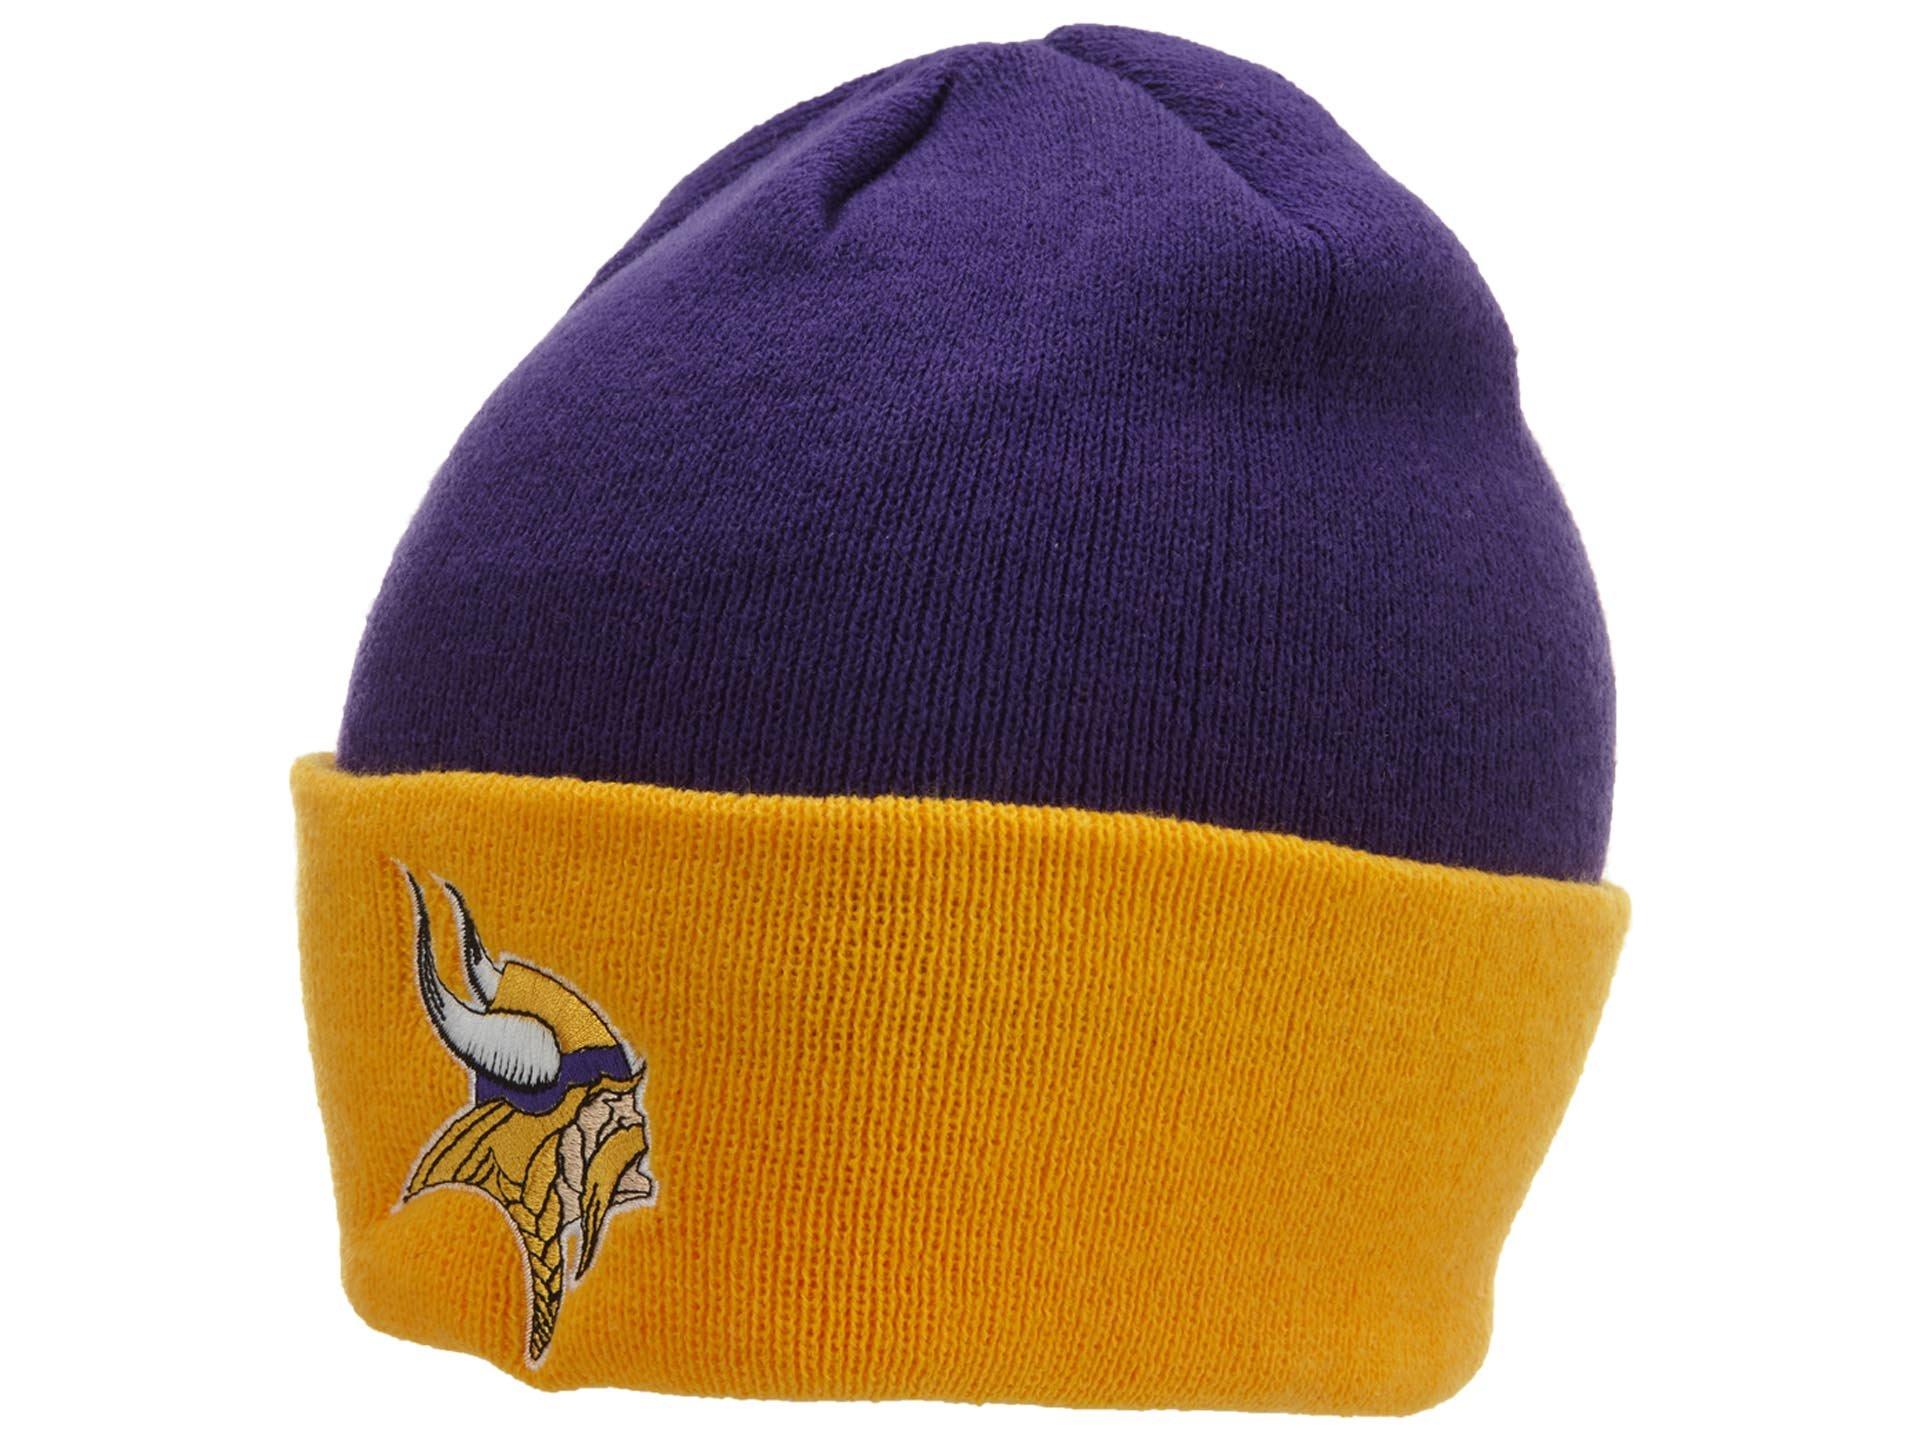 NFL End Zone Cuffed Knit Hat - K010Z, Minnesota Vikings, One Size Fits All